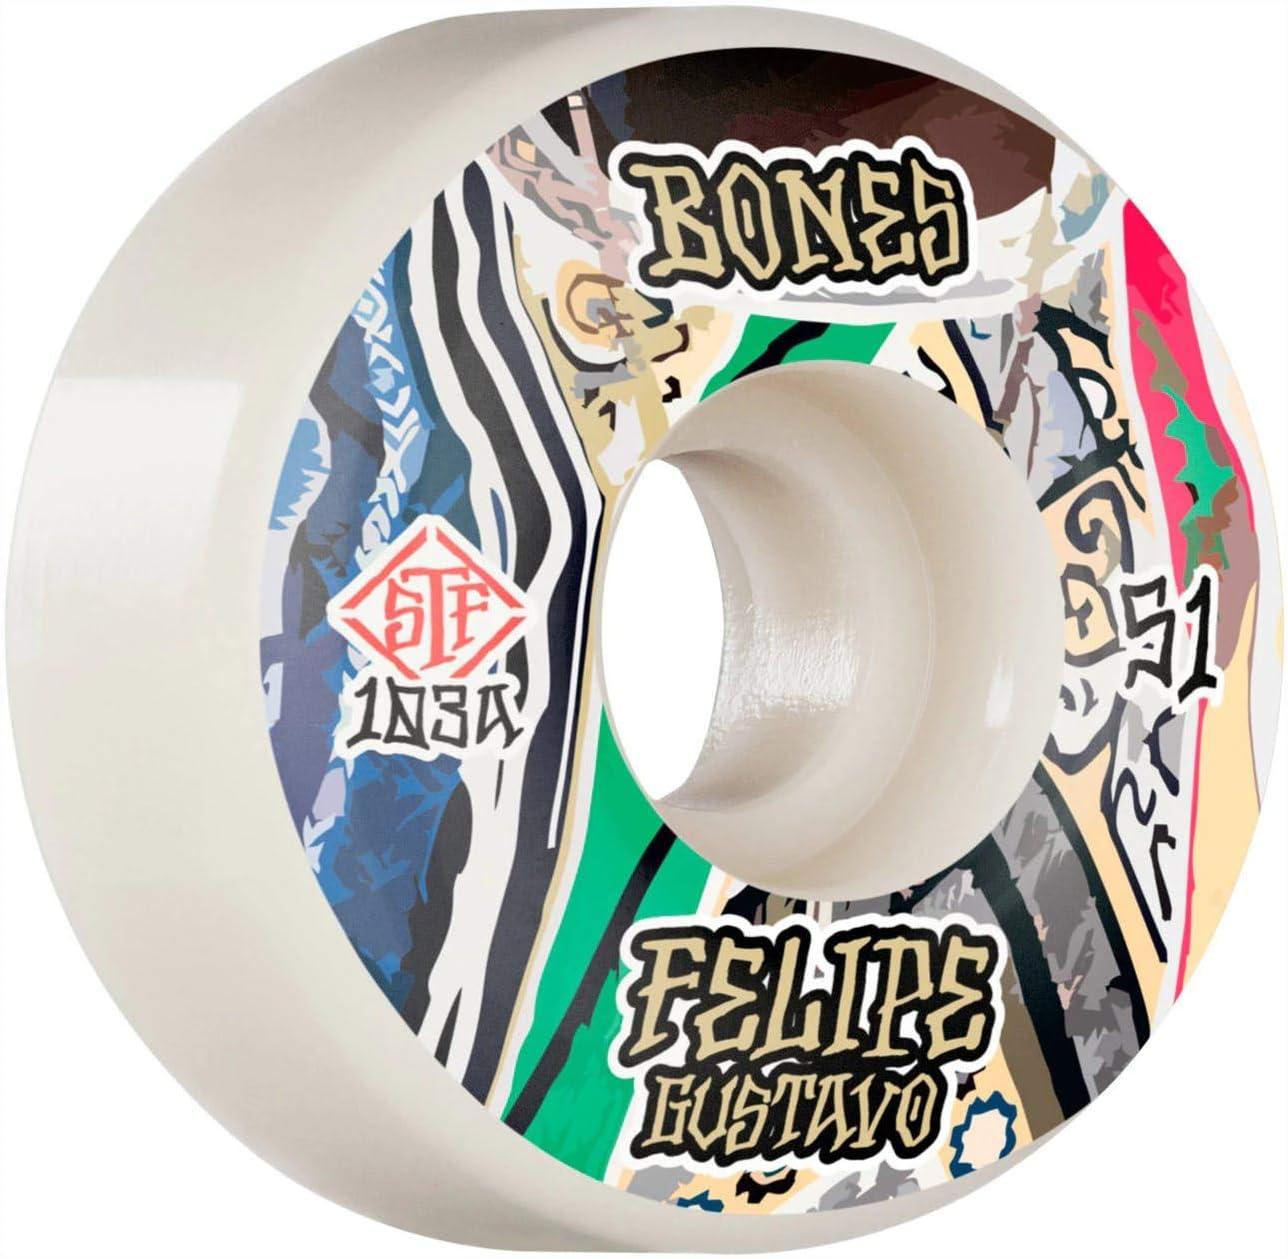 Bones STF Pro Gustavo Bed-Stuy Standard Wheels